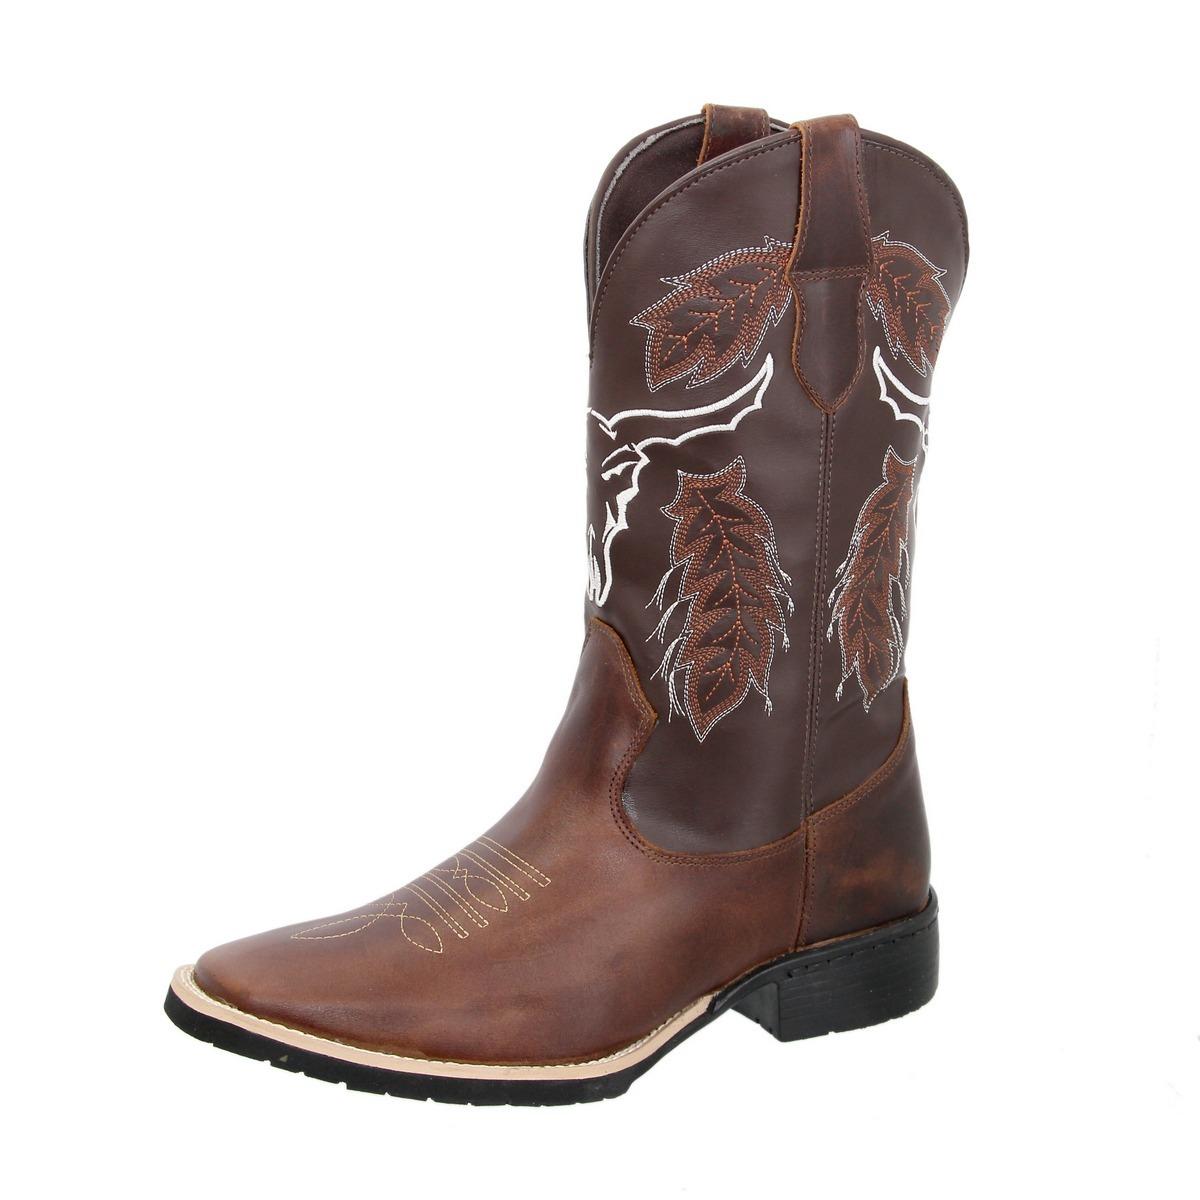 bota texana country masculina couroref  cara de boi+carteira. Carregando  zoom. d1564117178